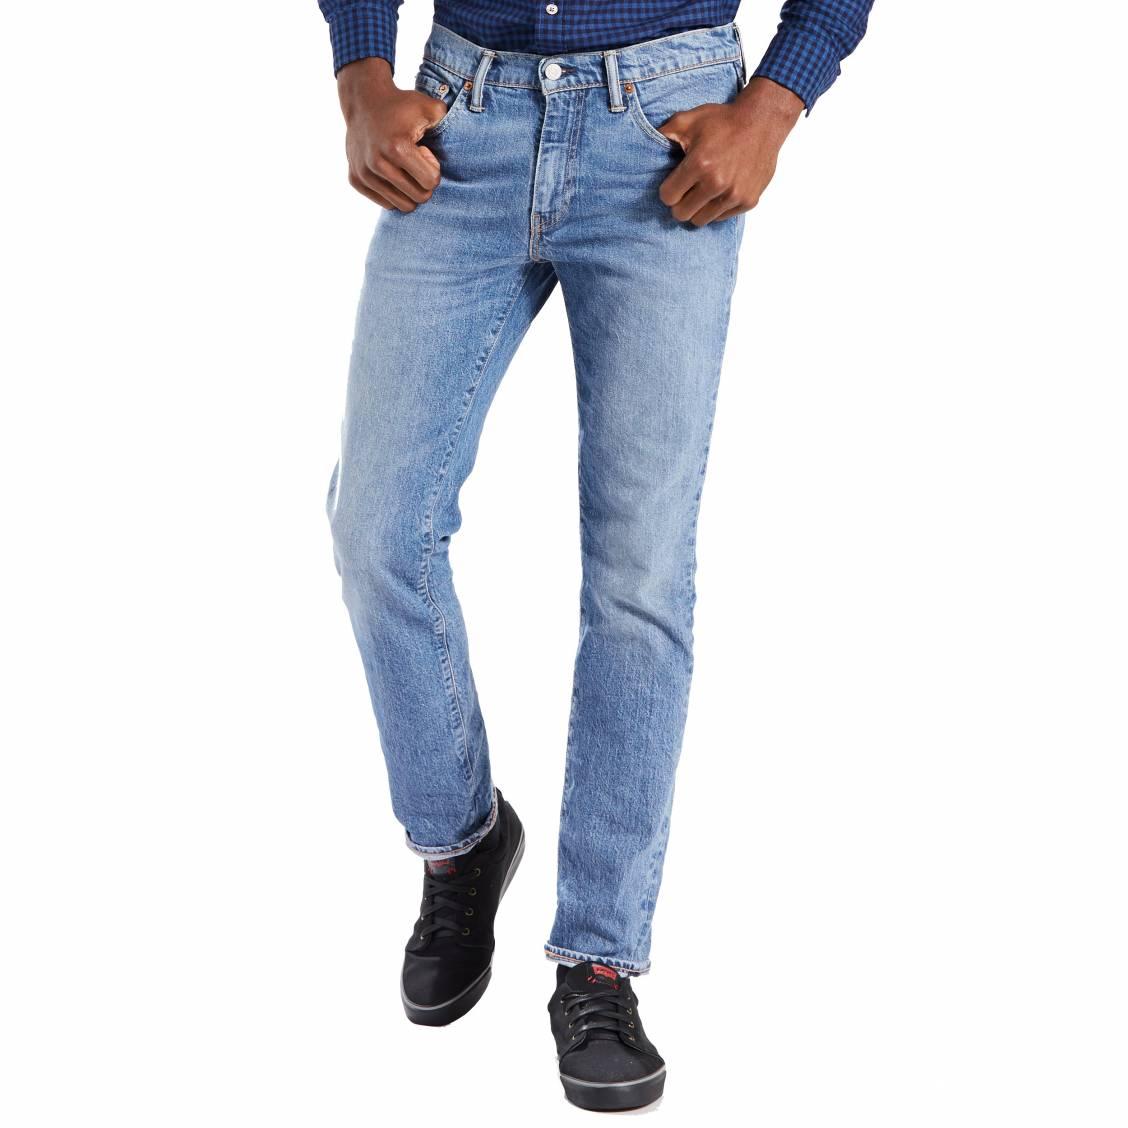 Fit Des Jean Hommes Levi's Slim 511 ThunderbirdRue Nnvw0m8O